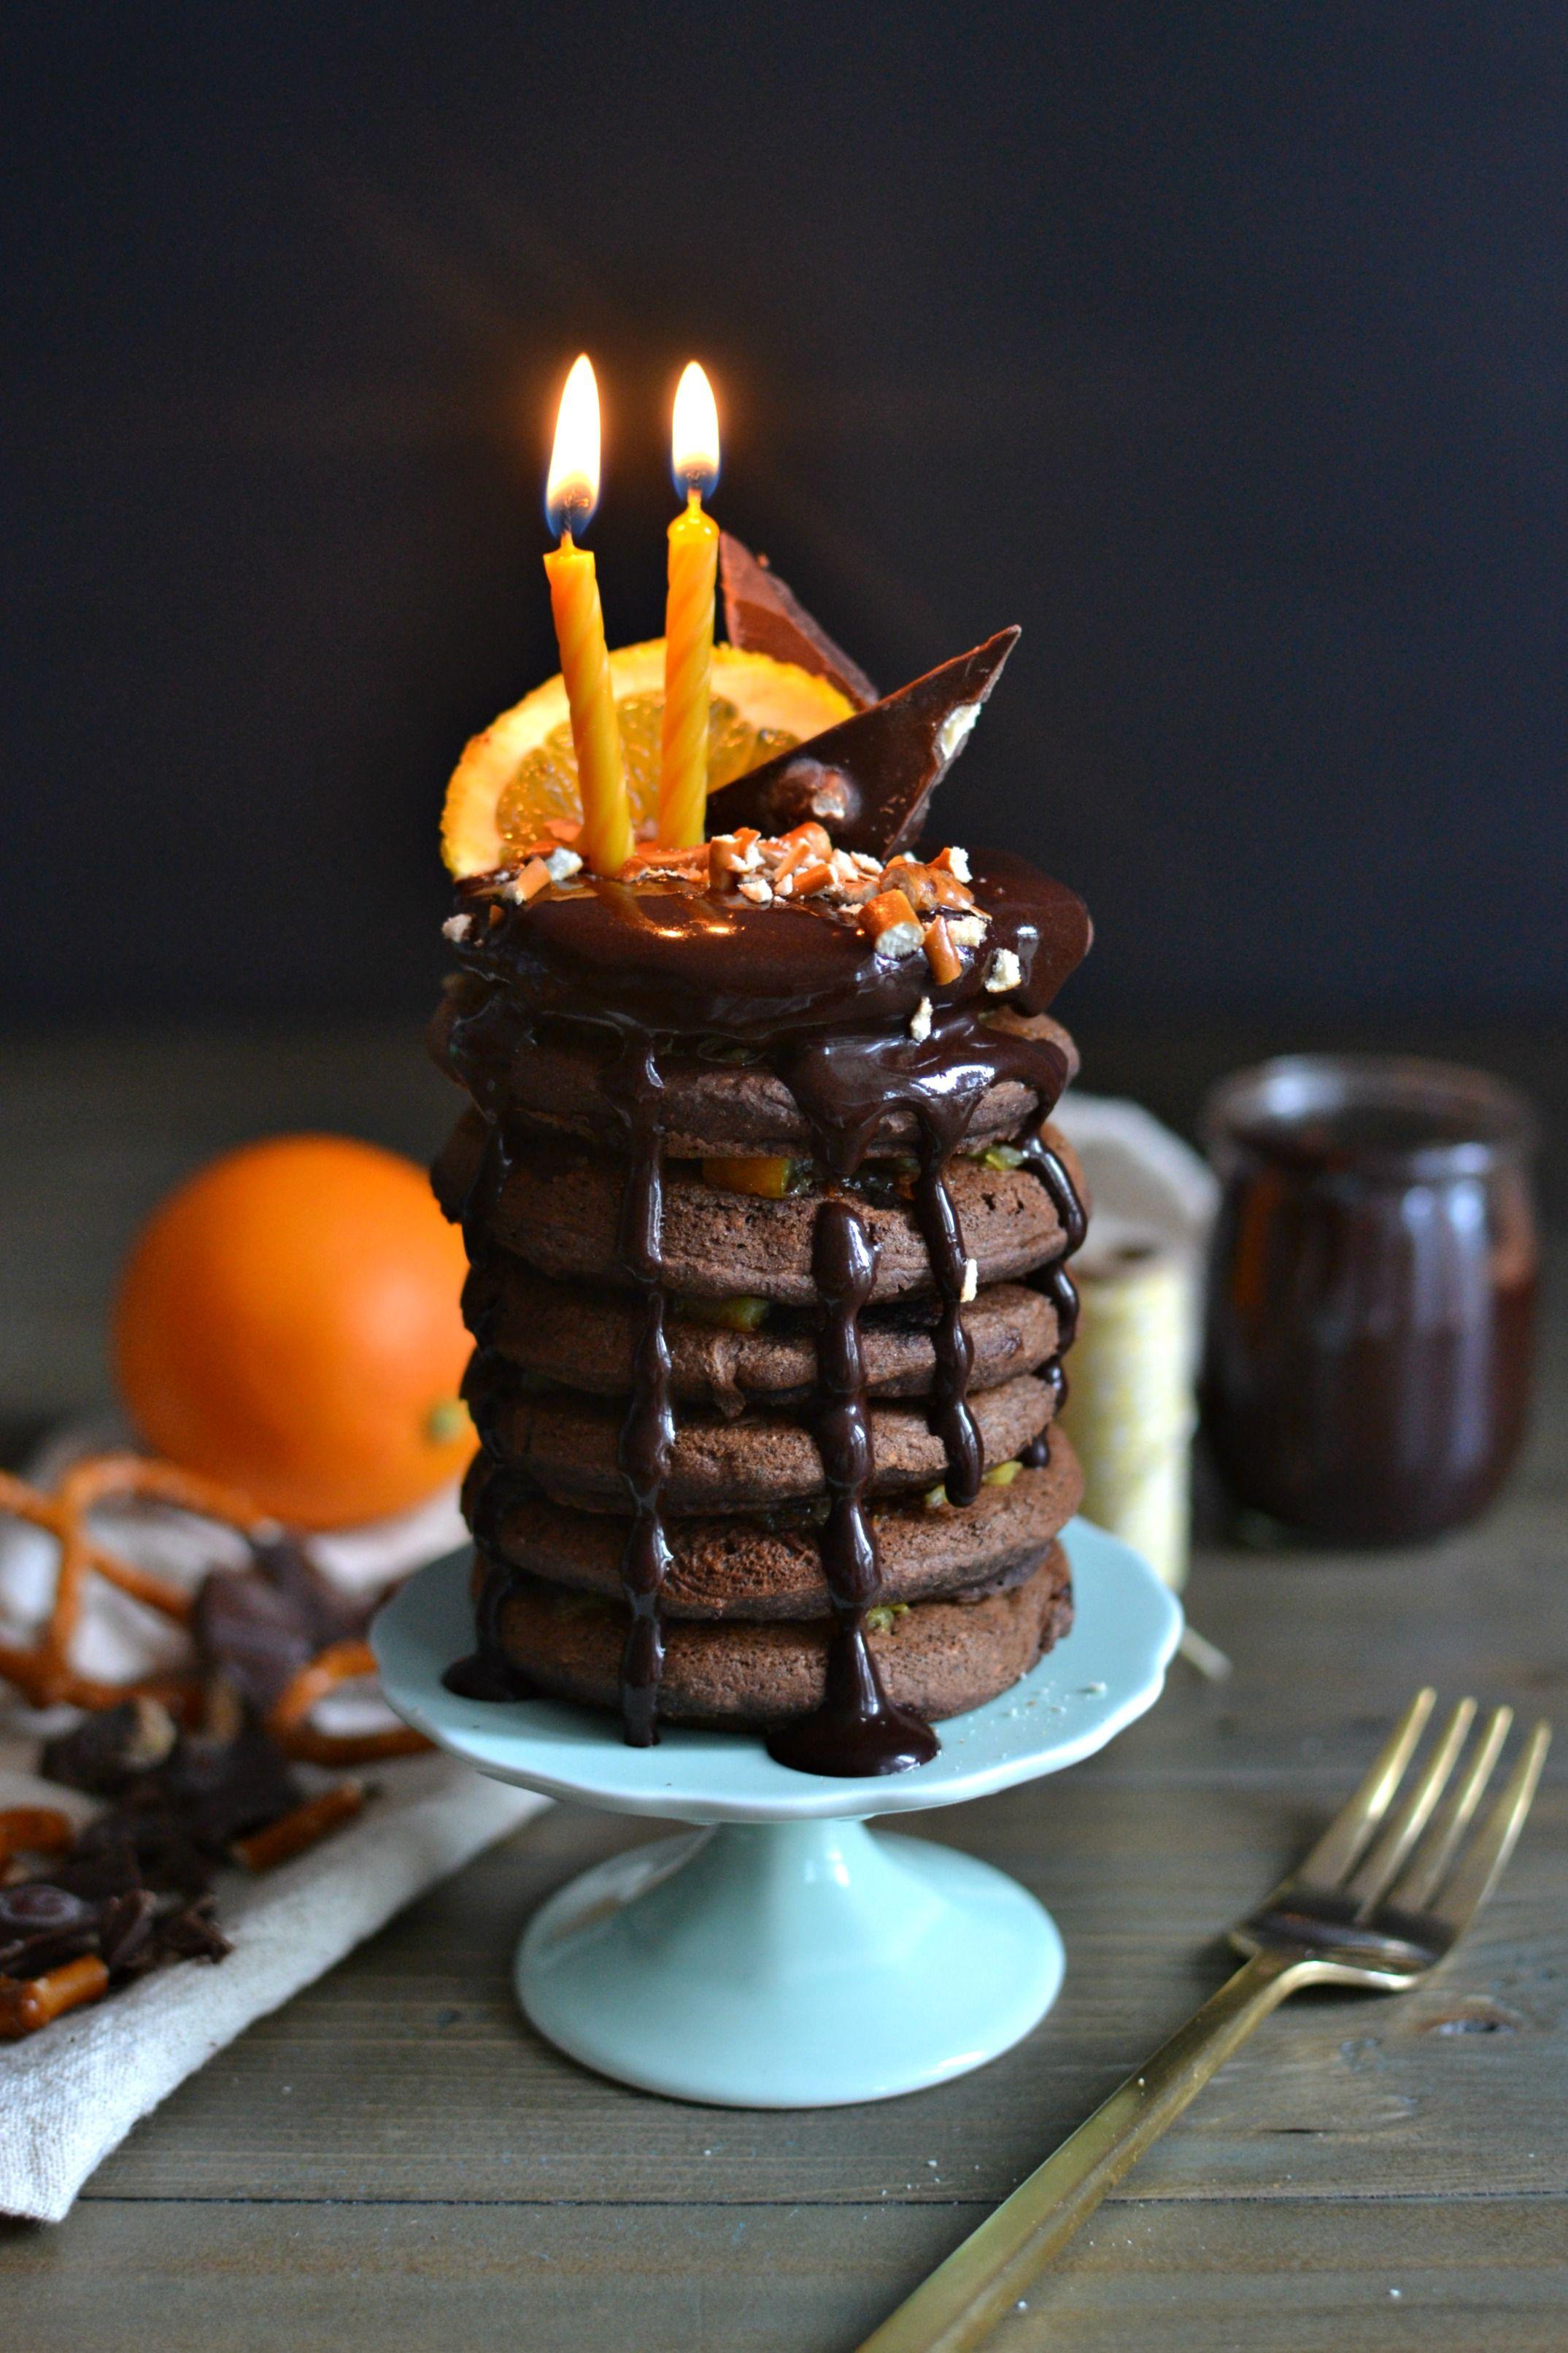 Buckwheat Chocolate Orange Pancakes with chocolate sauce, chocolate bark, and pretzels (vegan & gluten free)   http://www.radiantrachels.com/buckwheat-chocolate-orange-pancakes/